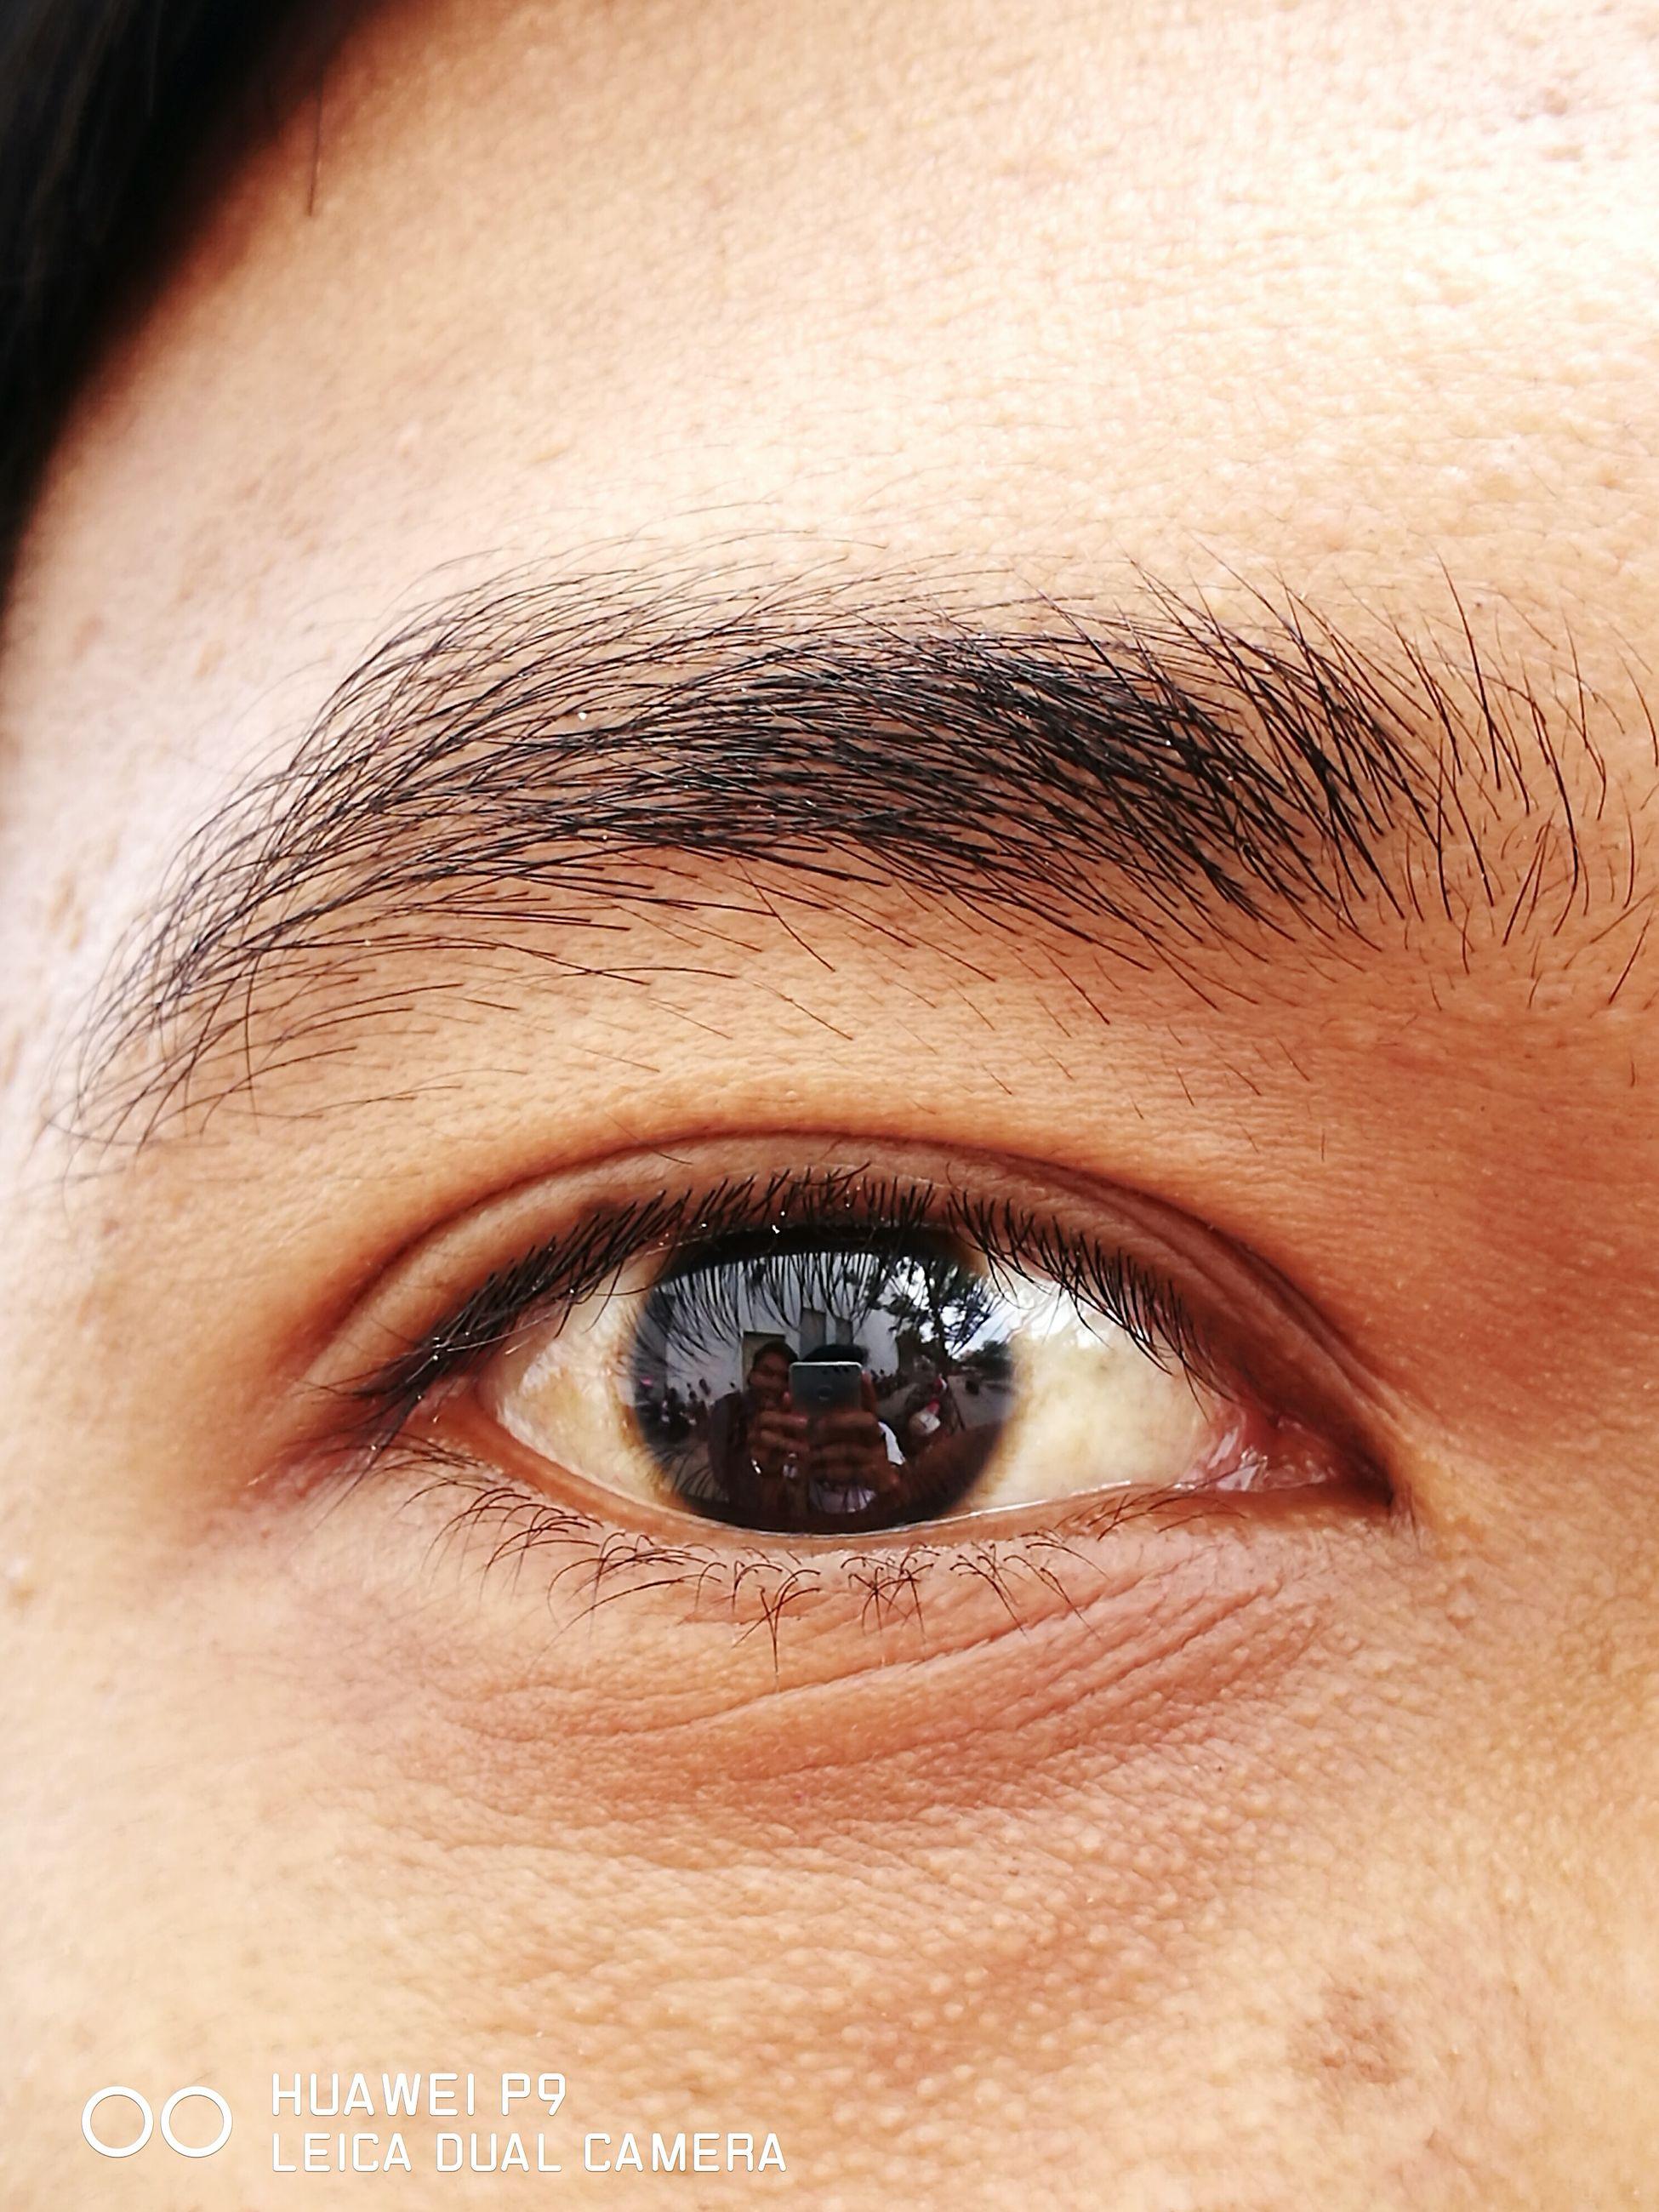 human eye, close-up, eyesight, eyelash, part of, human skin, human face, sensory perception, extreme close-up, lifestyles, iris - eye, eyeball, portrait, extreme close up, headshot, unrecognizable person, leisure activity, full frame, detail, cropped, macro, selective focus, backgrounds